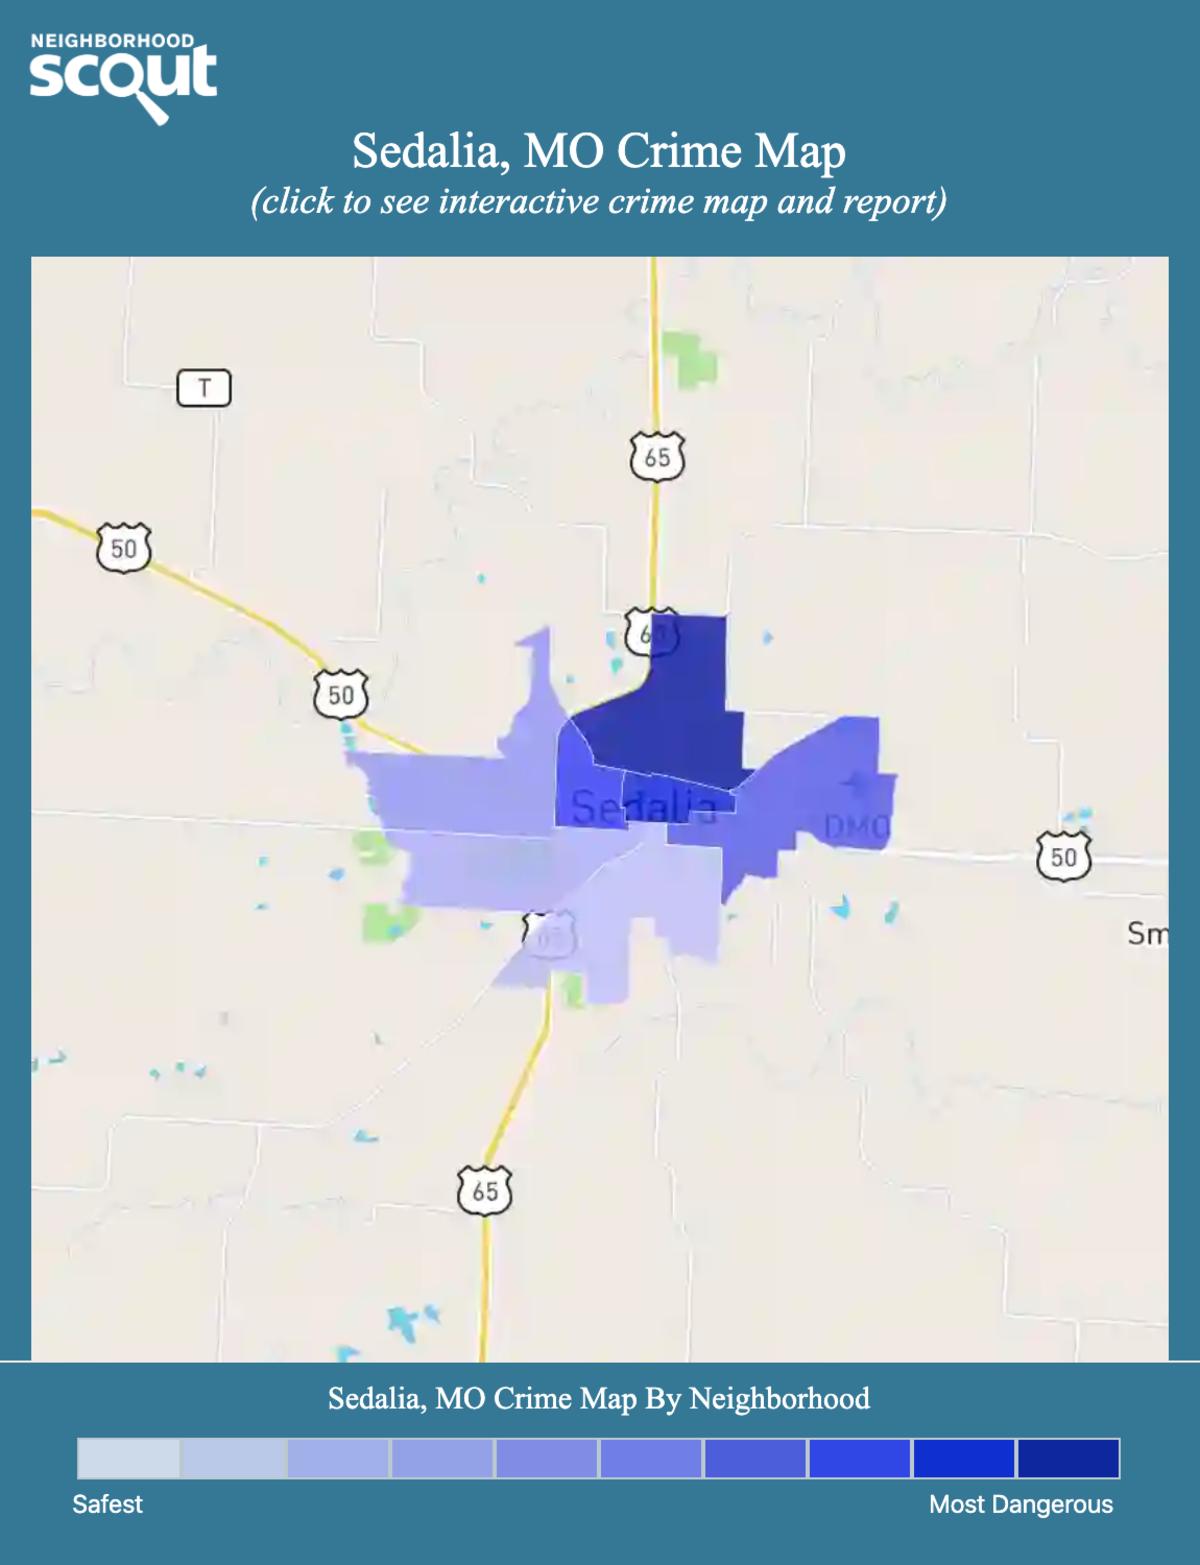 Sedalia, Missouri crime map